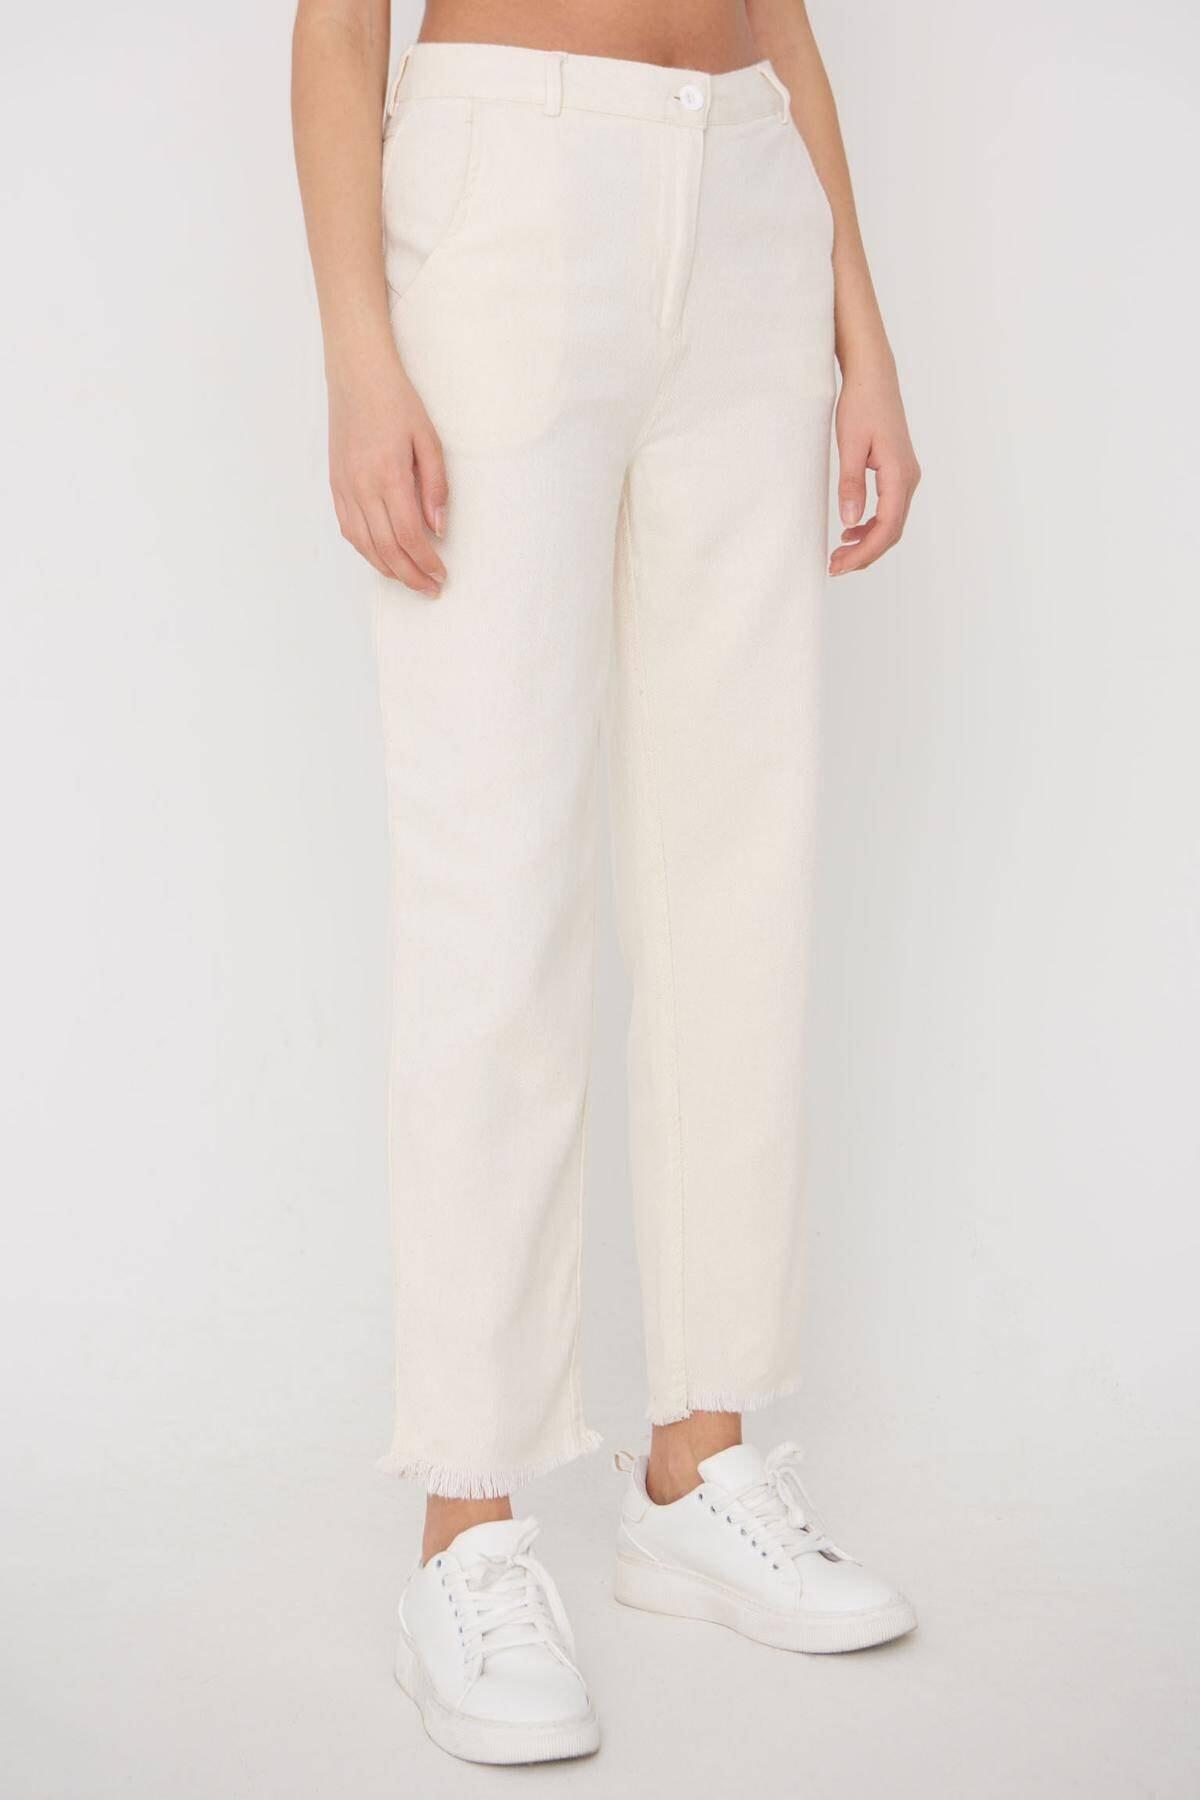 Addax Kadın Ham Paça Detaylı Pantolon Pn11-0049 - K8 Adx-0000023876 0